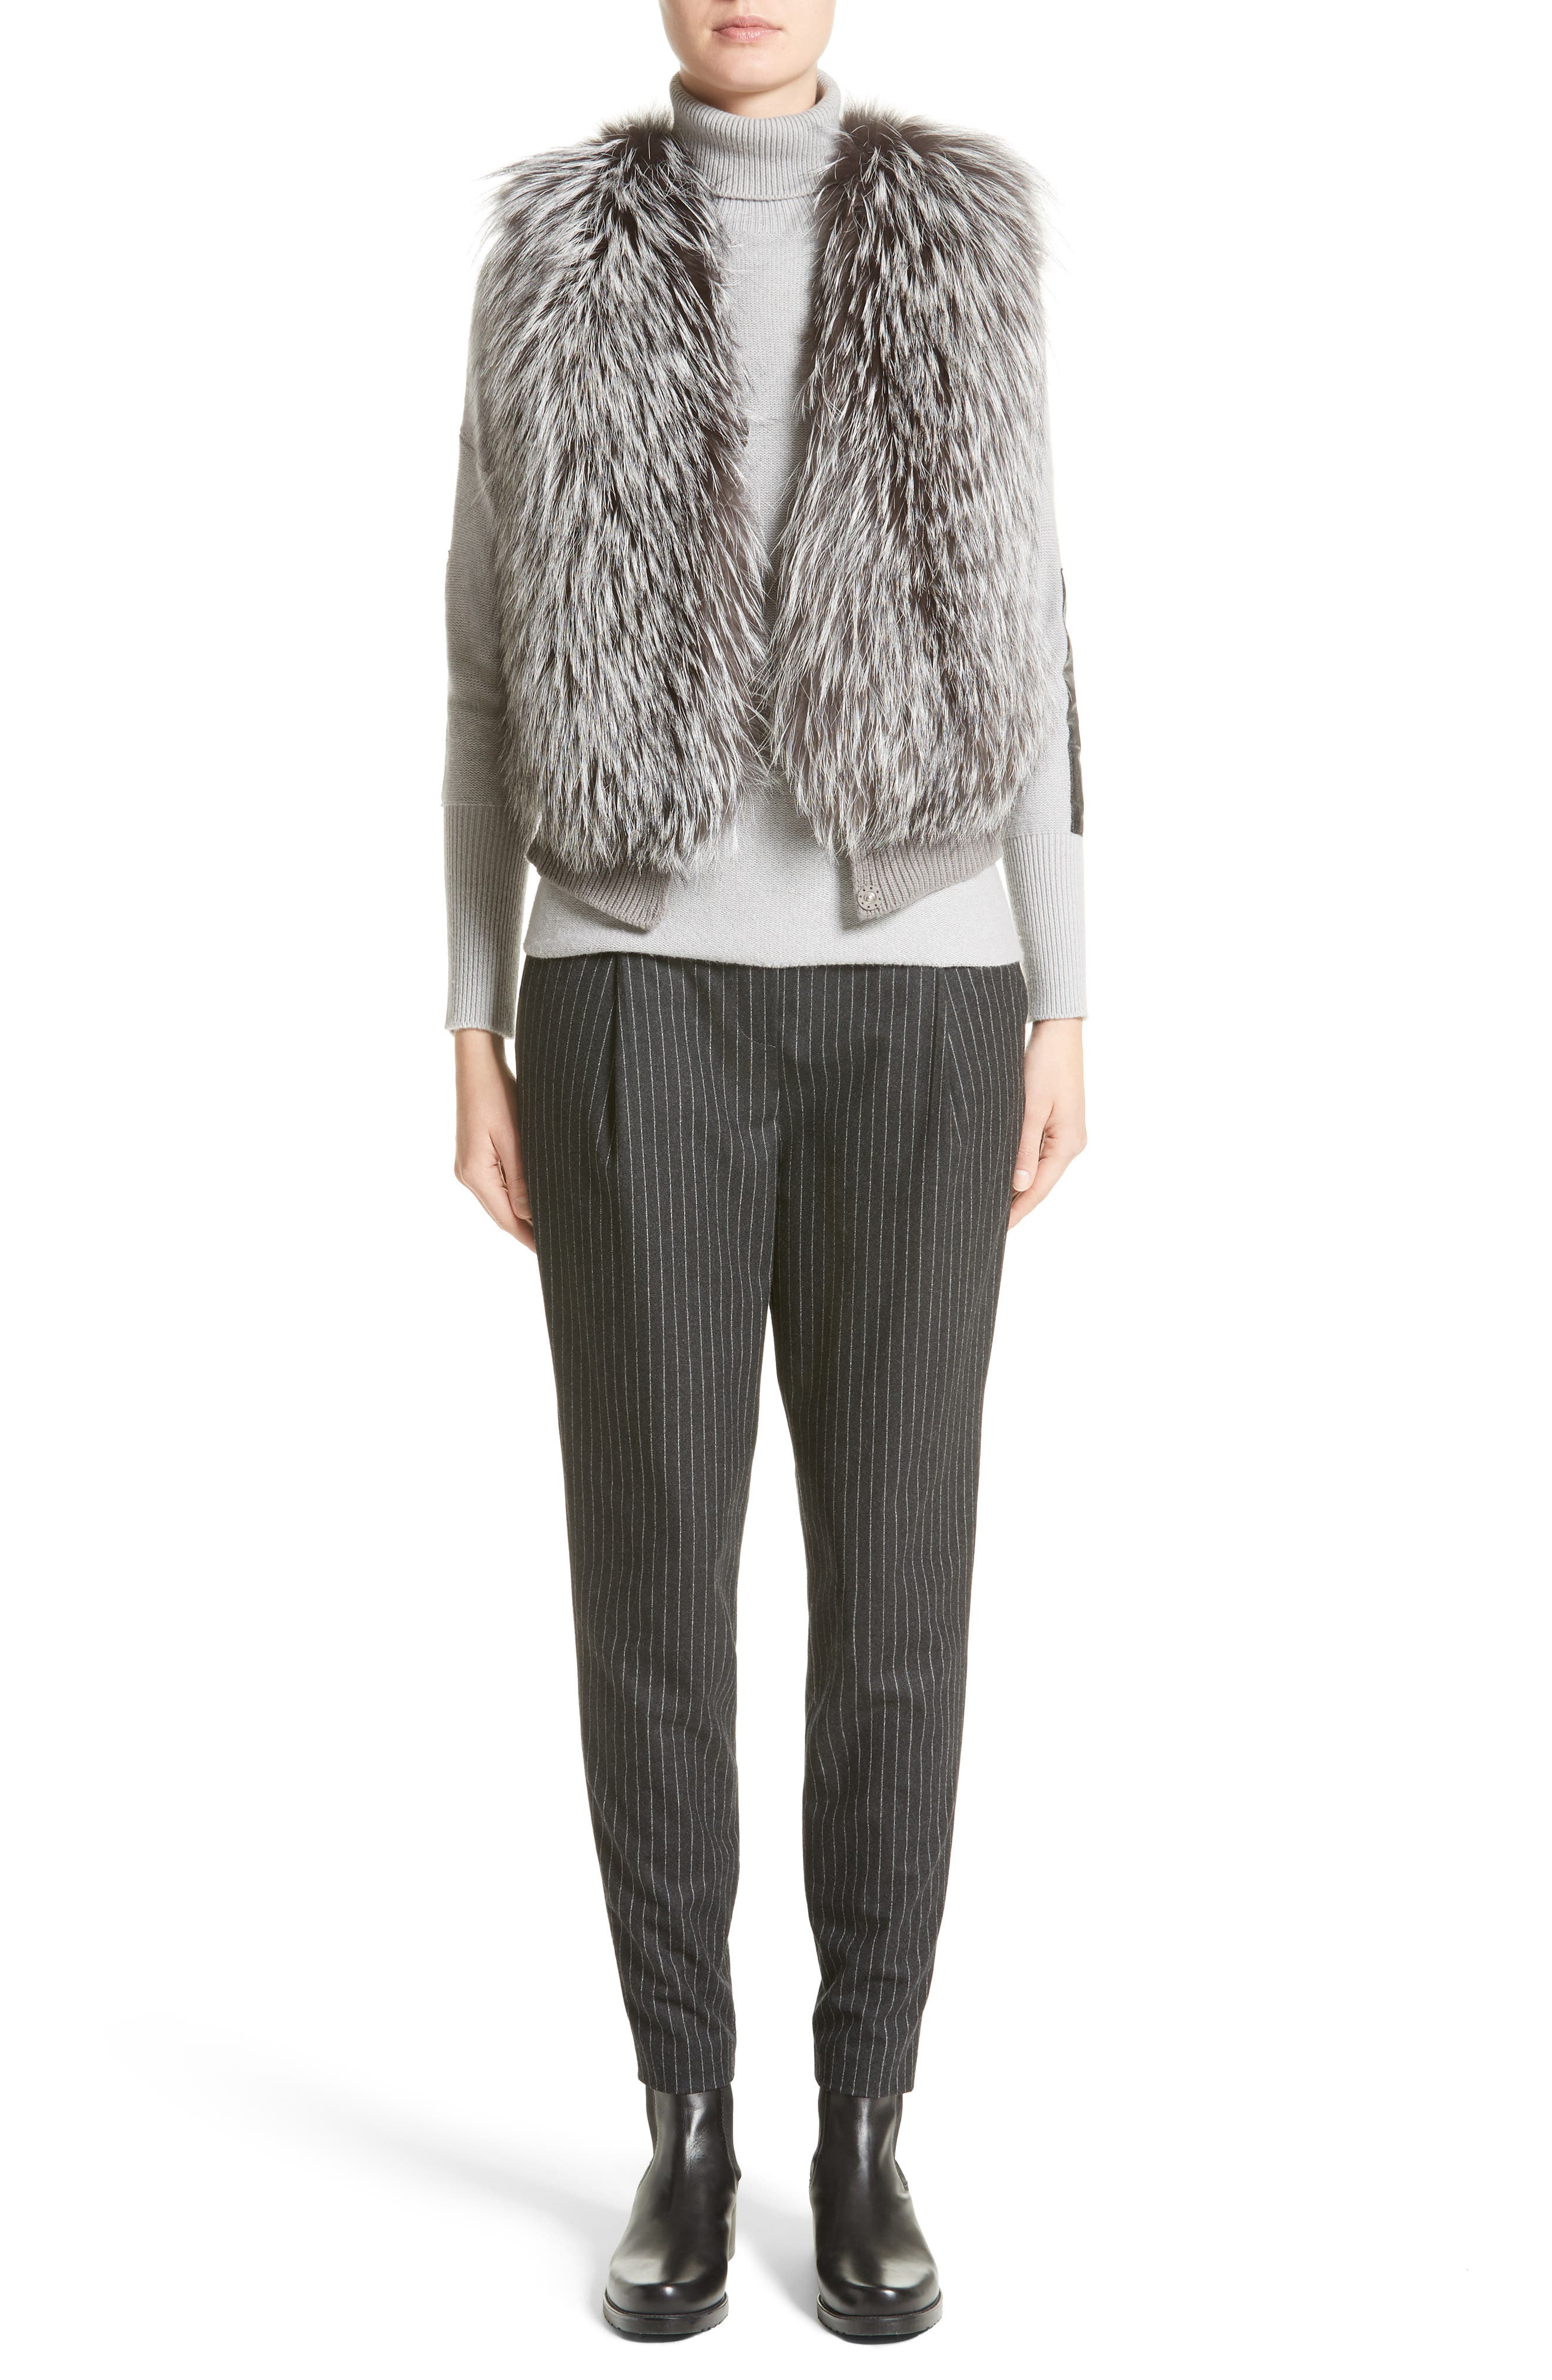 Wool, Silk & Cashmere Knit Turtleneck,                             Alternate thumbnail 6, color,                             050